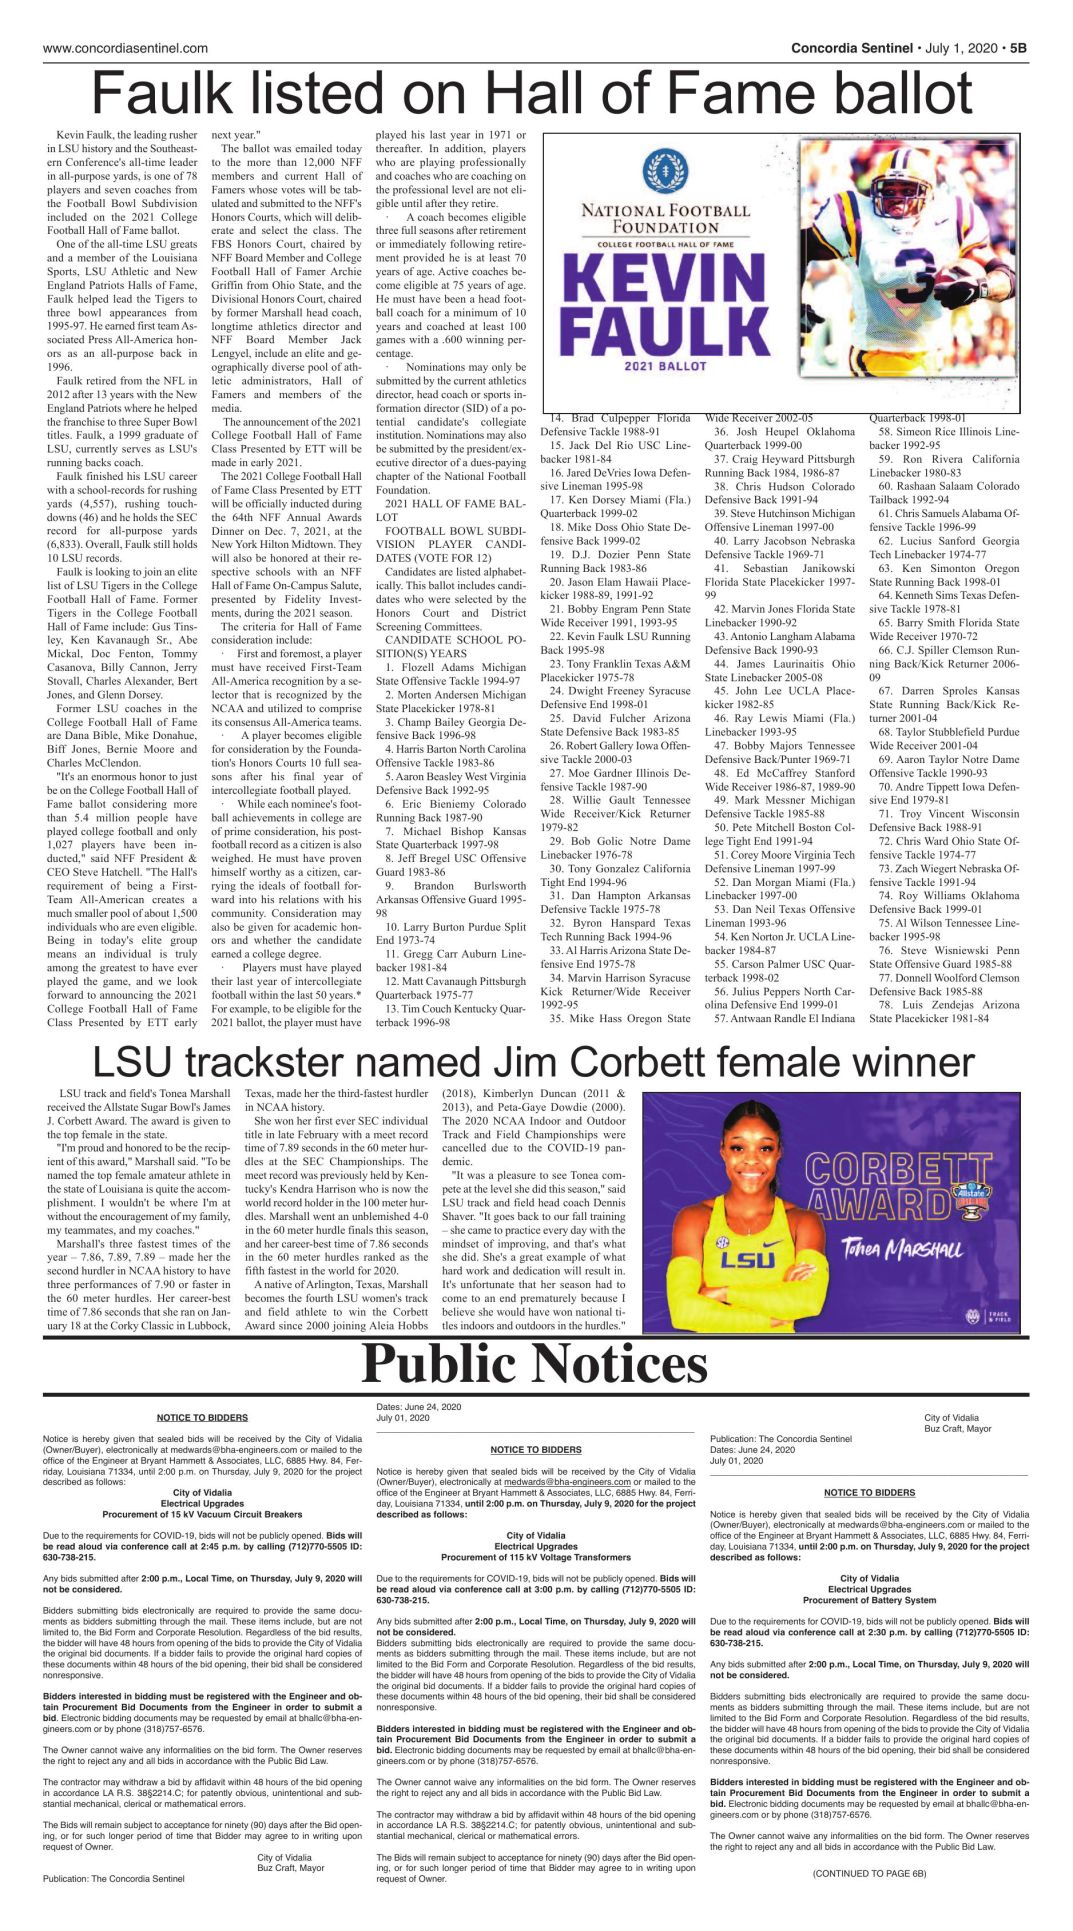 Public Notices - July 1, 2020